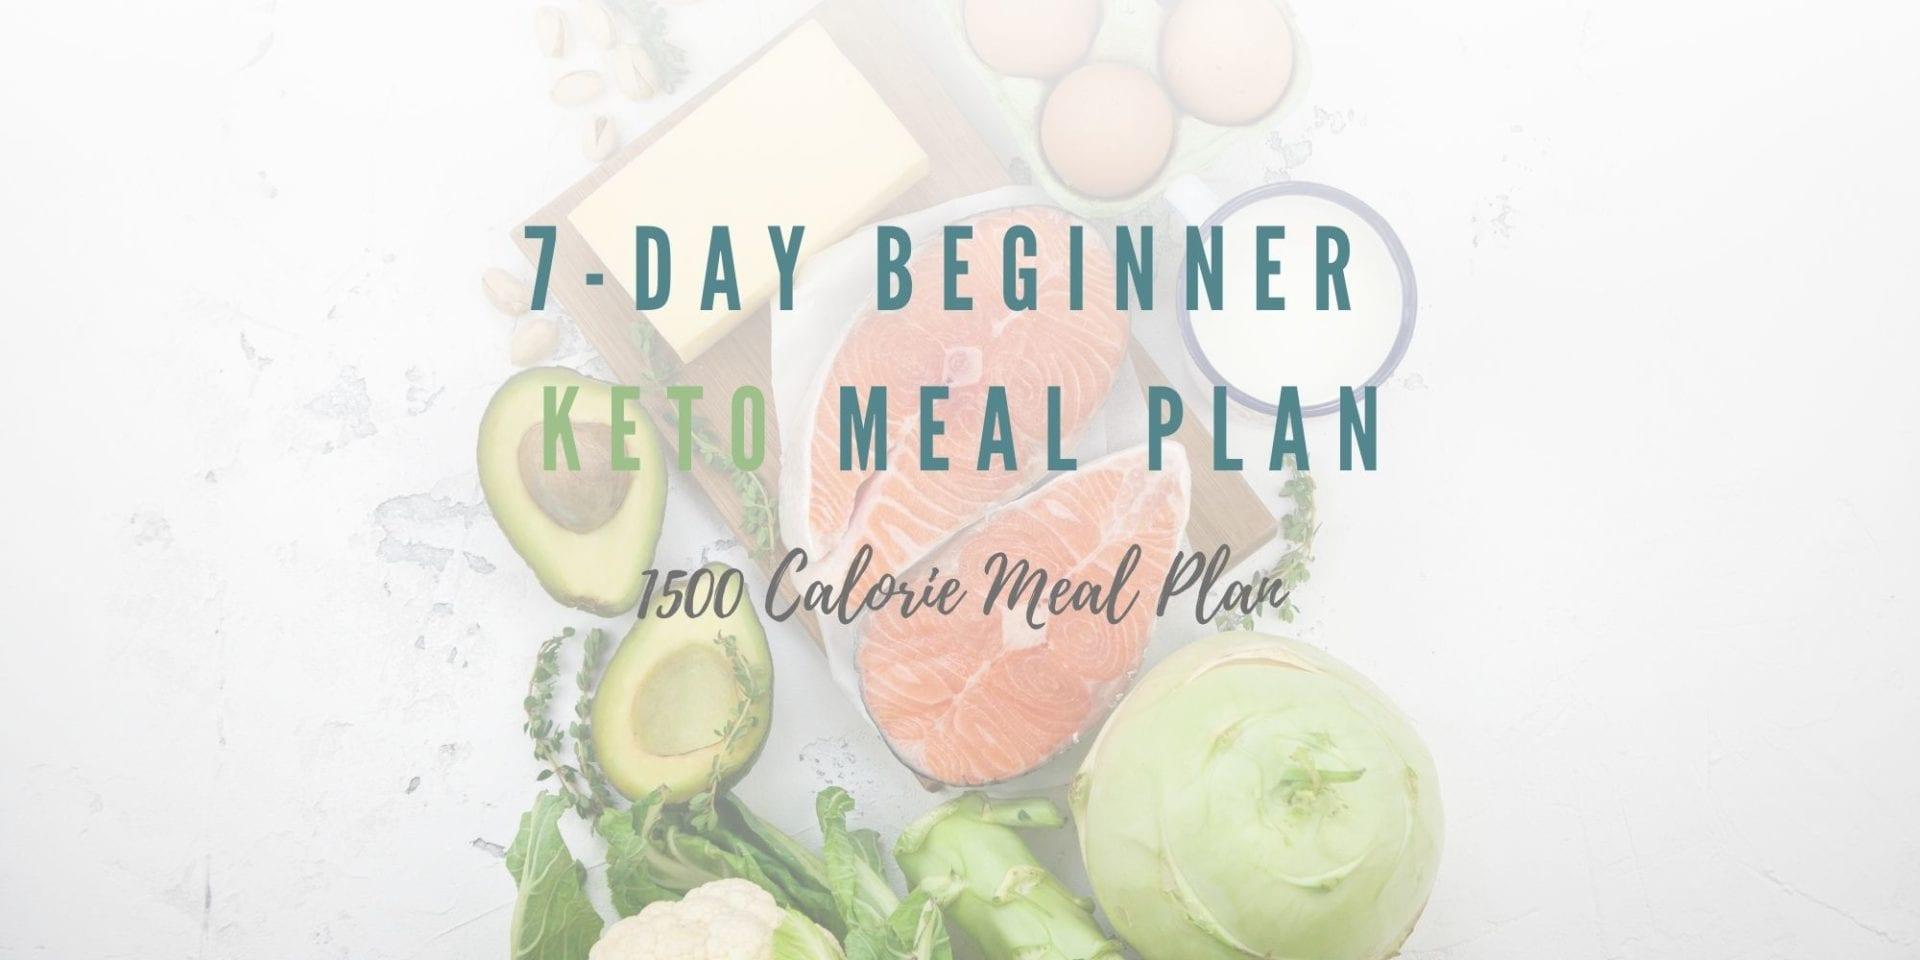 7 Day Beginner - 1,500 Calorie Meal Plan